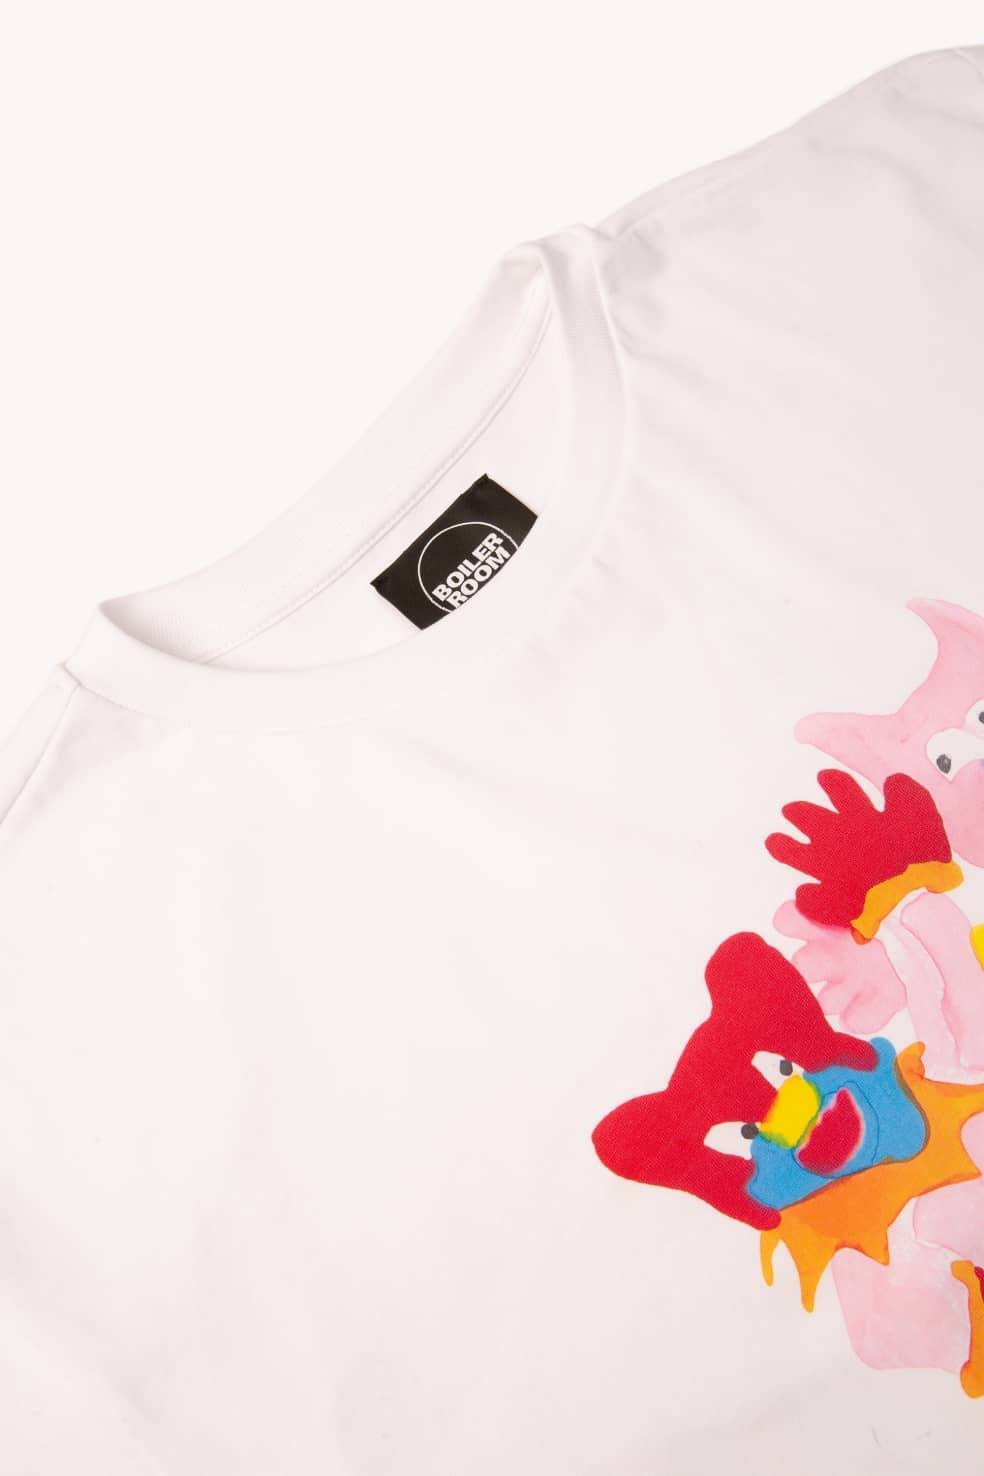 Boiler Room x Eris Drew Dance Together T-Shirt - Off White | T-Shirt by Boiler Room 3